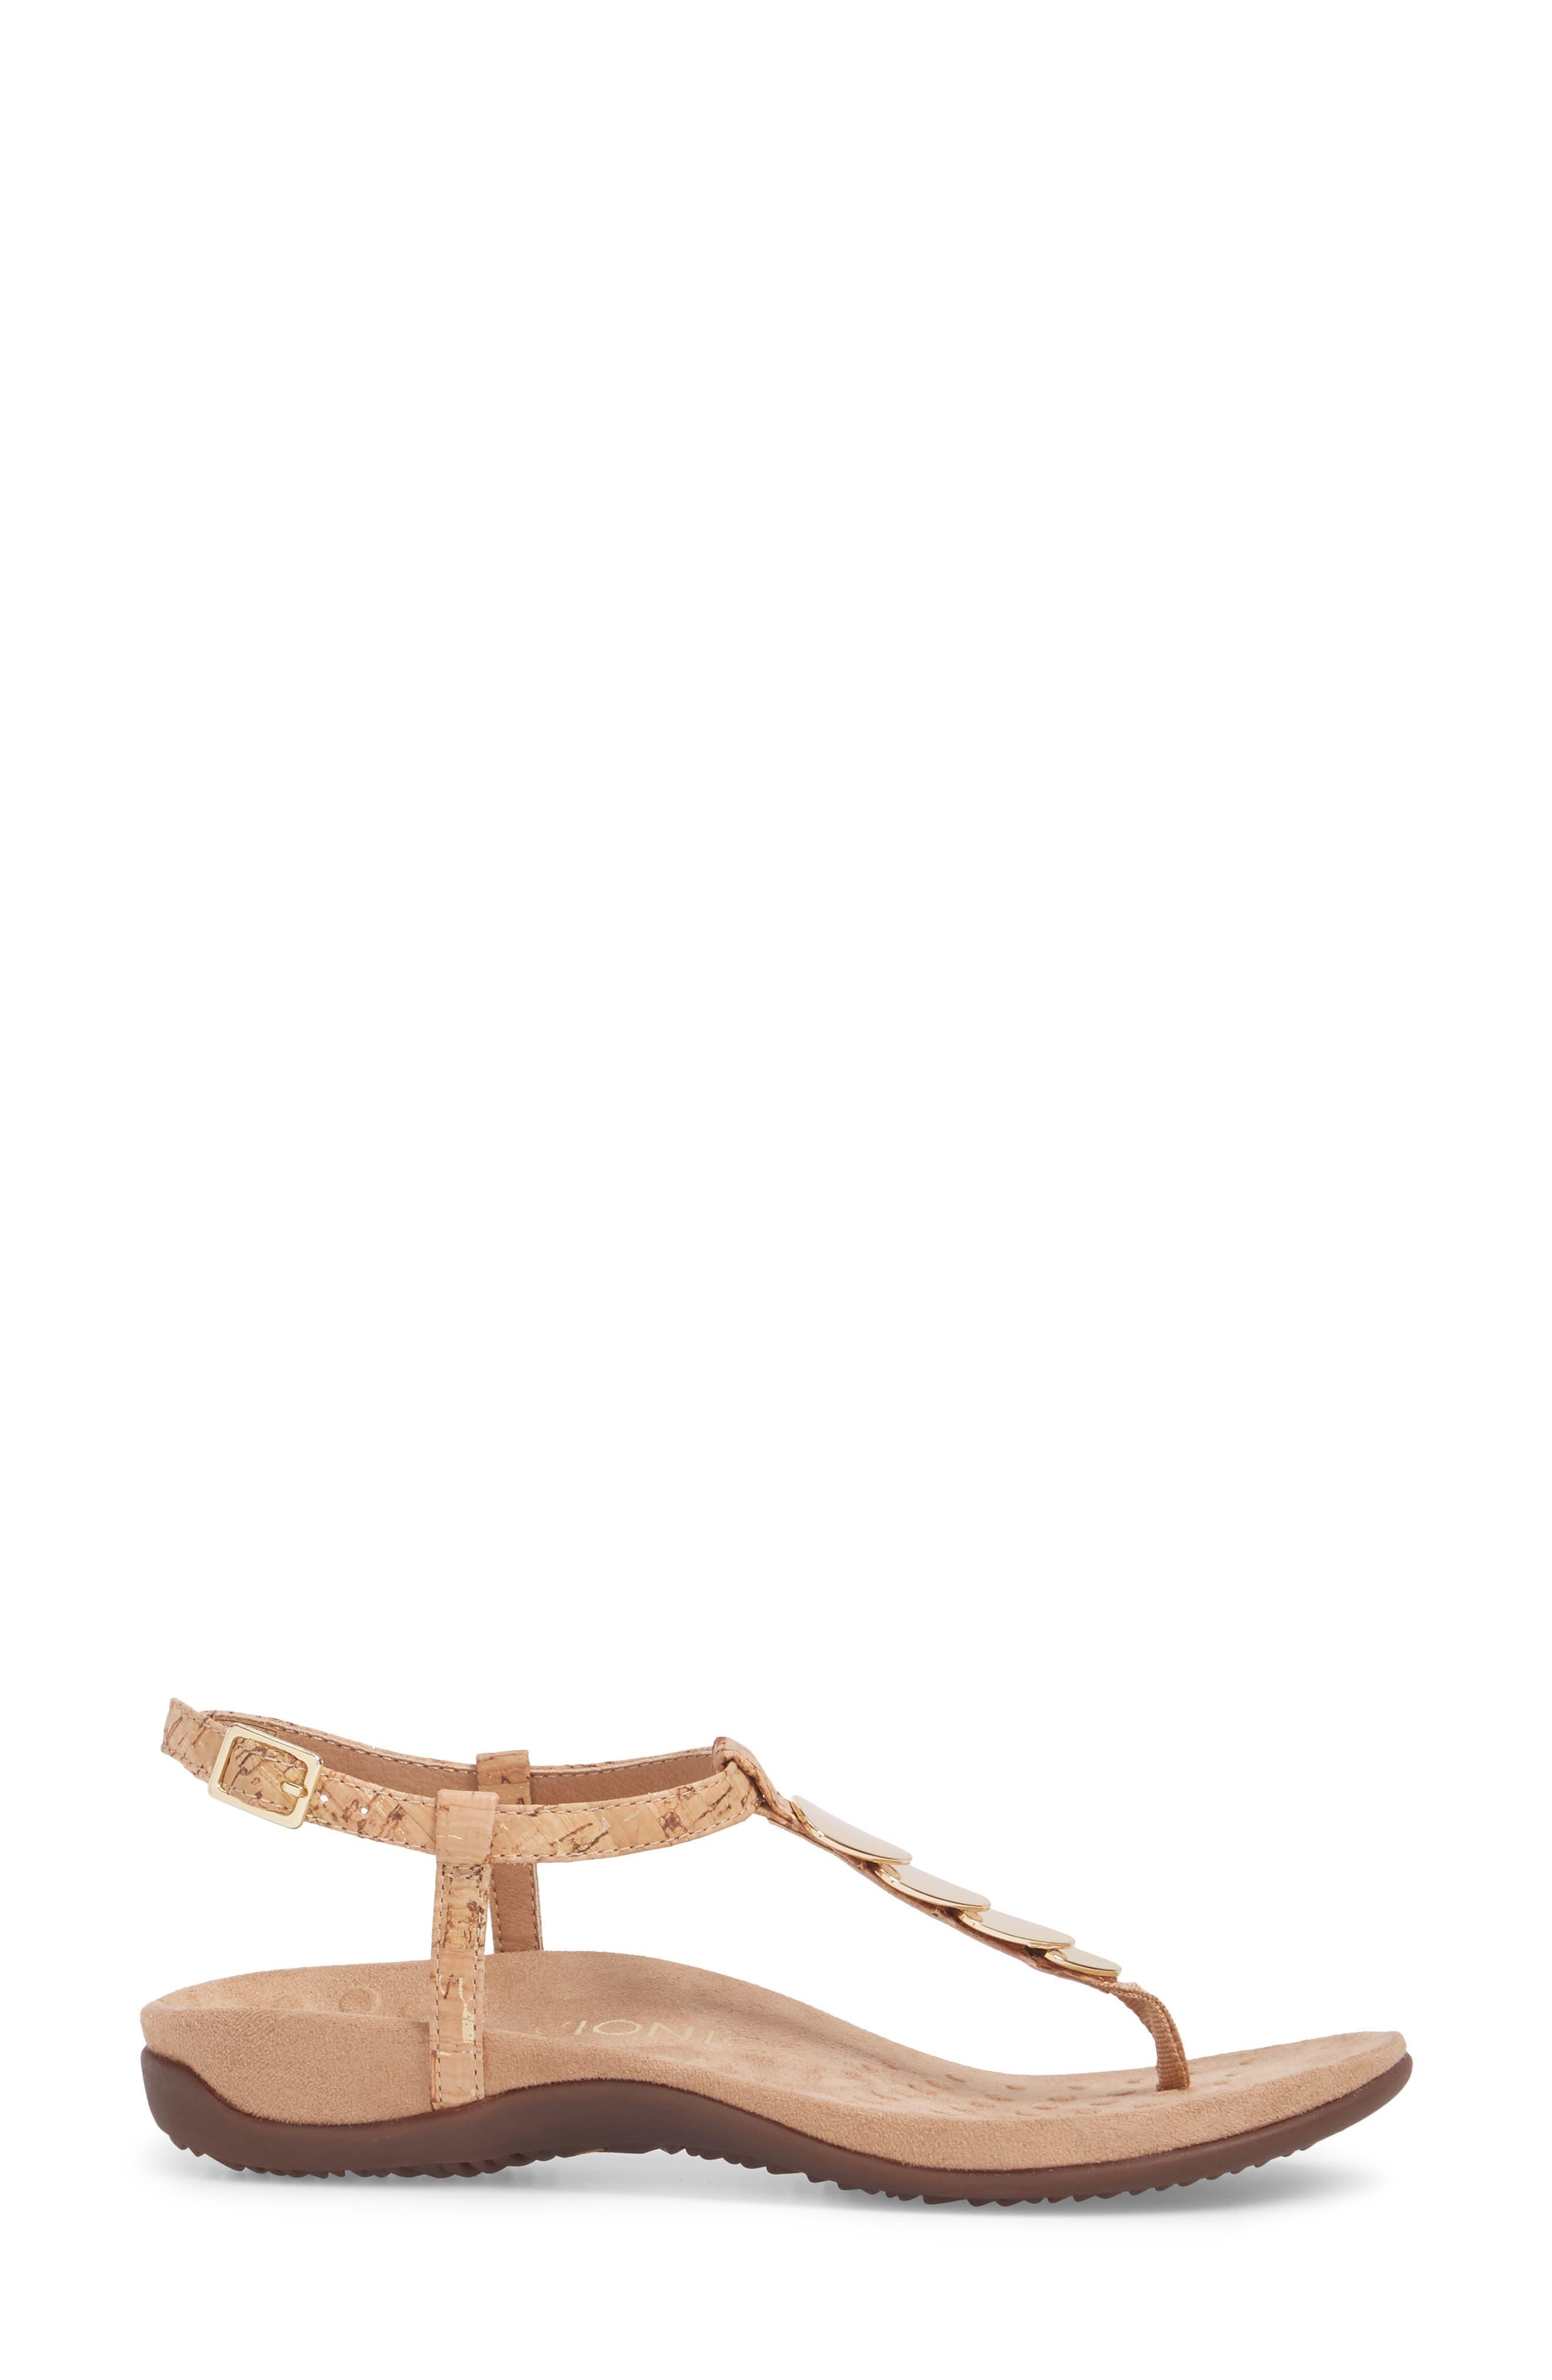 Miami T-Strap Sandal,                             Alternate thumbnail 3, color,                             Natural Cork Fabric